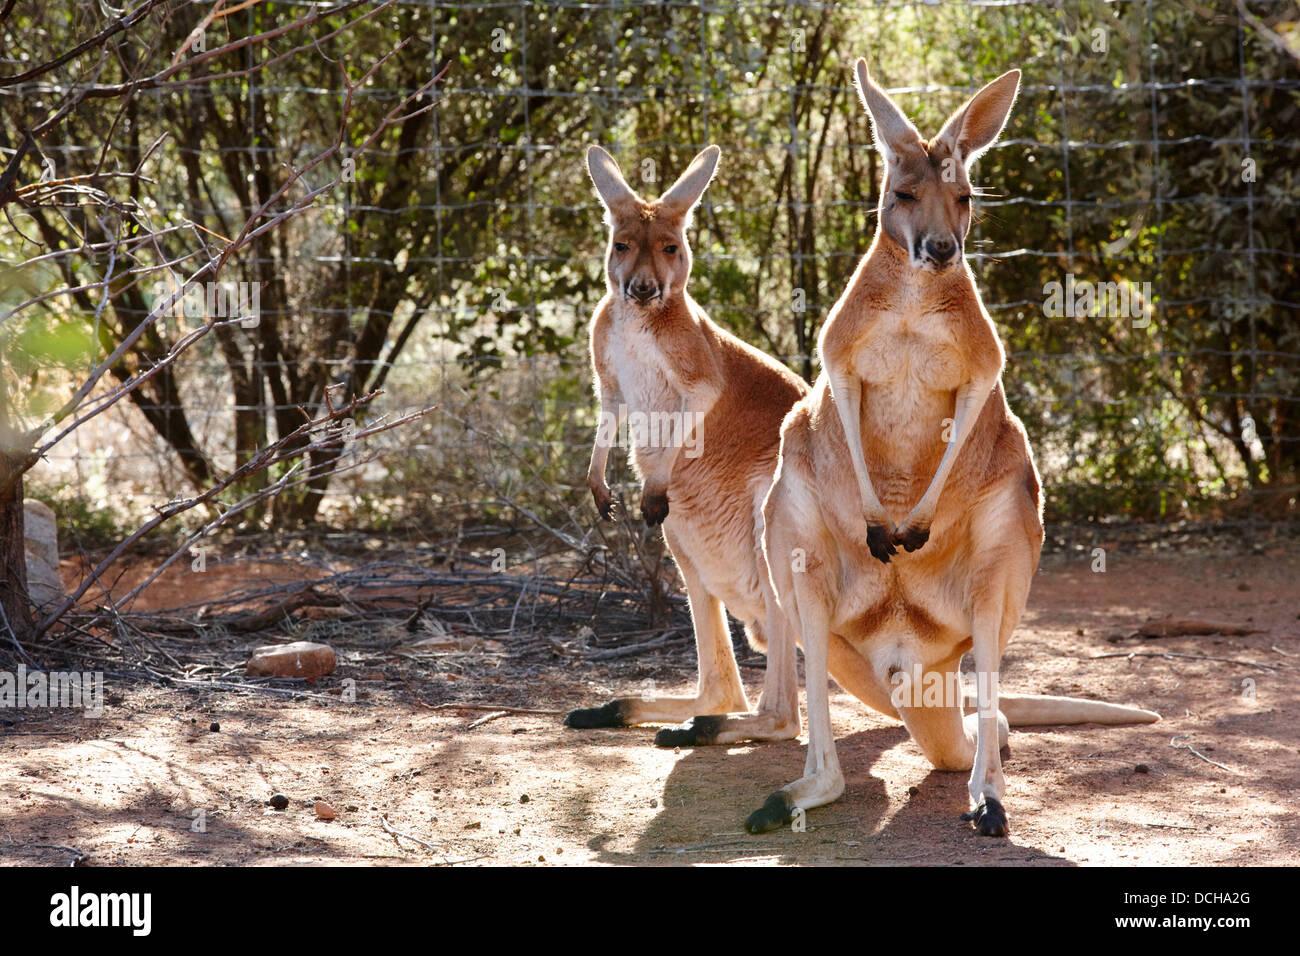 Kangaroo (Macropus Rufus) at Alice Springs Desert Park, Australia - Stock Image